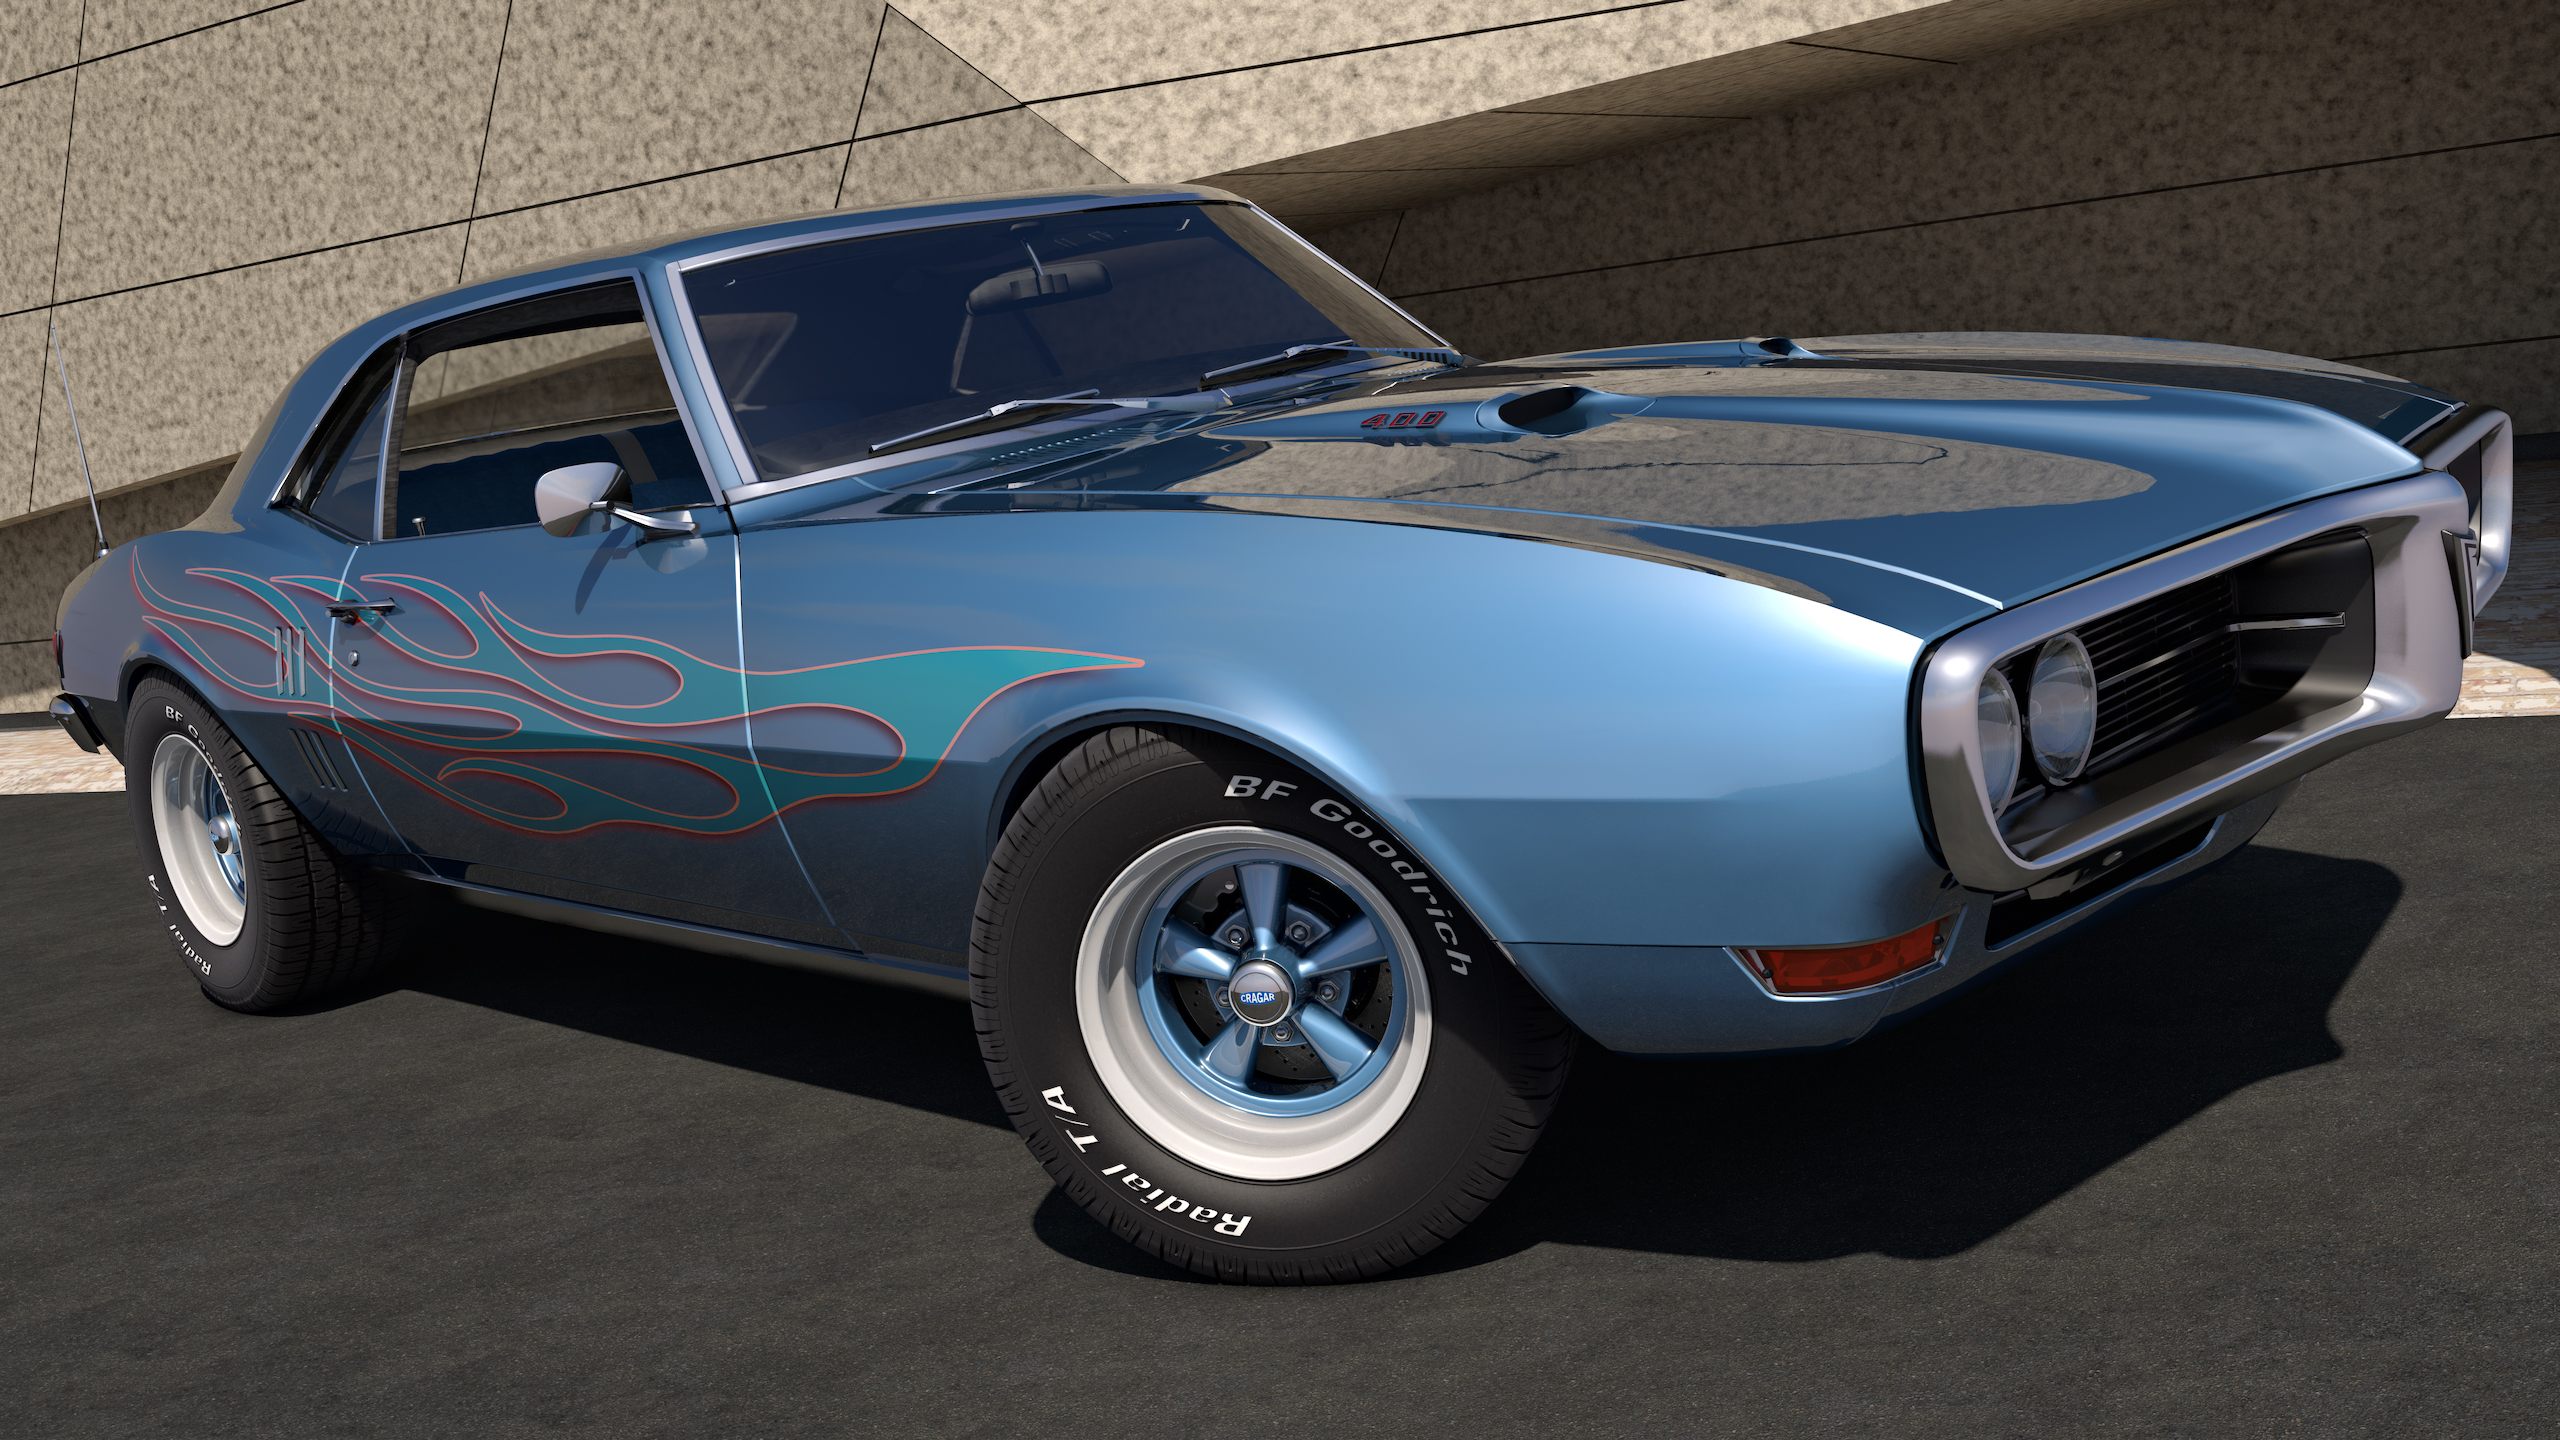 1968 Pontiac Firebird 400 by SamCurry on DeviantArt